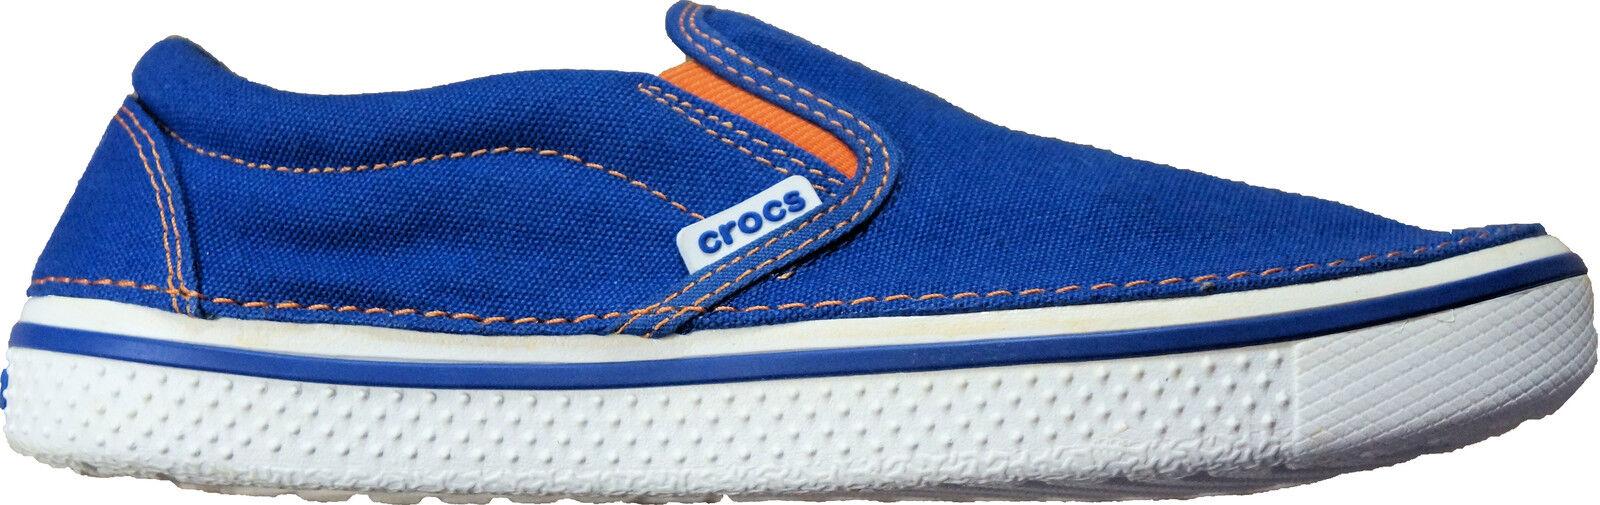 Crocs Men's Hover Slip On  Cerulean bluee   White   orange  Relaxed Fit